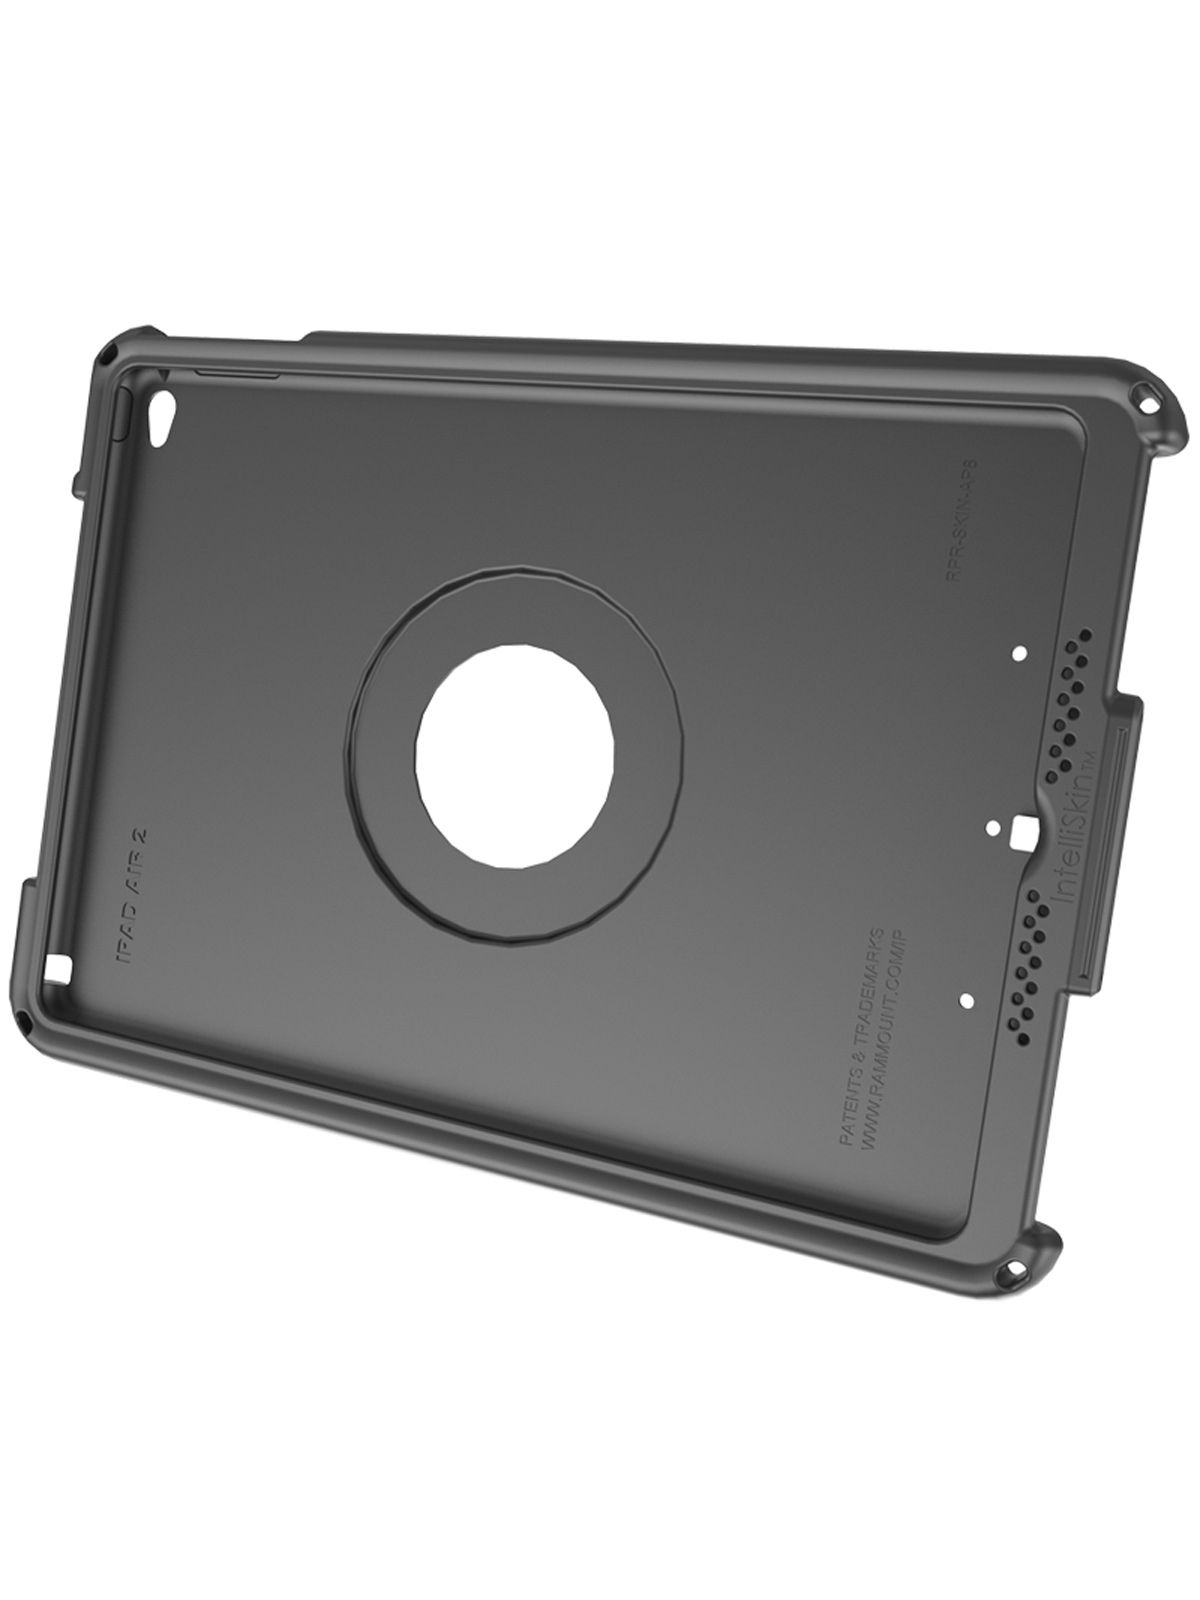 RAM Mounts IntelliSkin Lade-/Schutzhülle Apple iPad Air 2 - GDS-Technologie